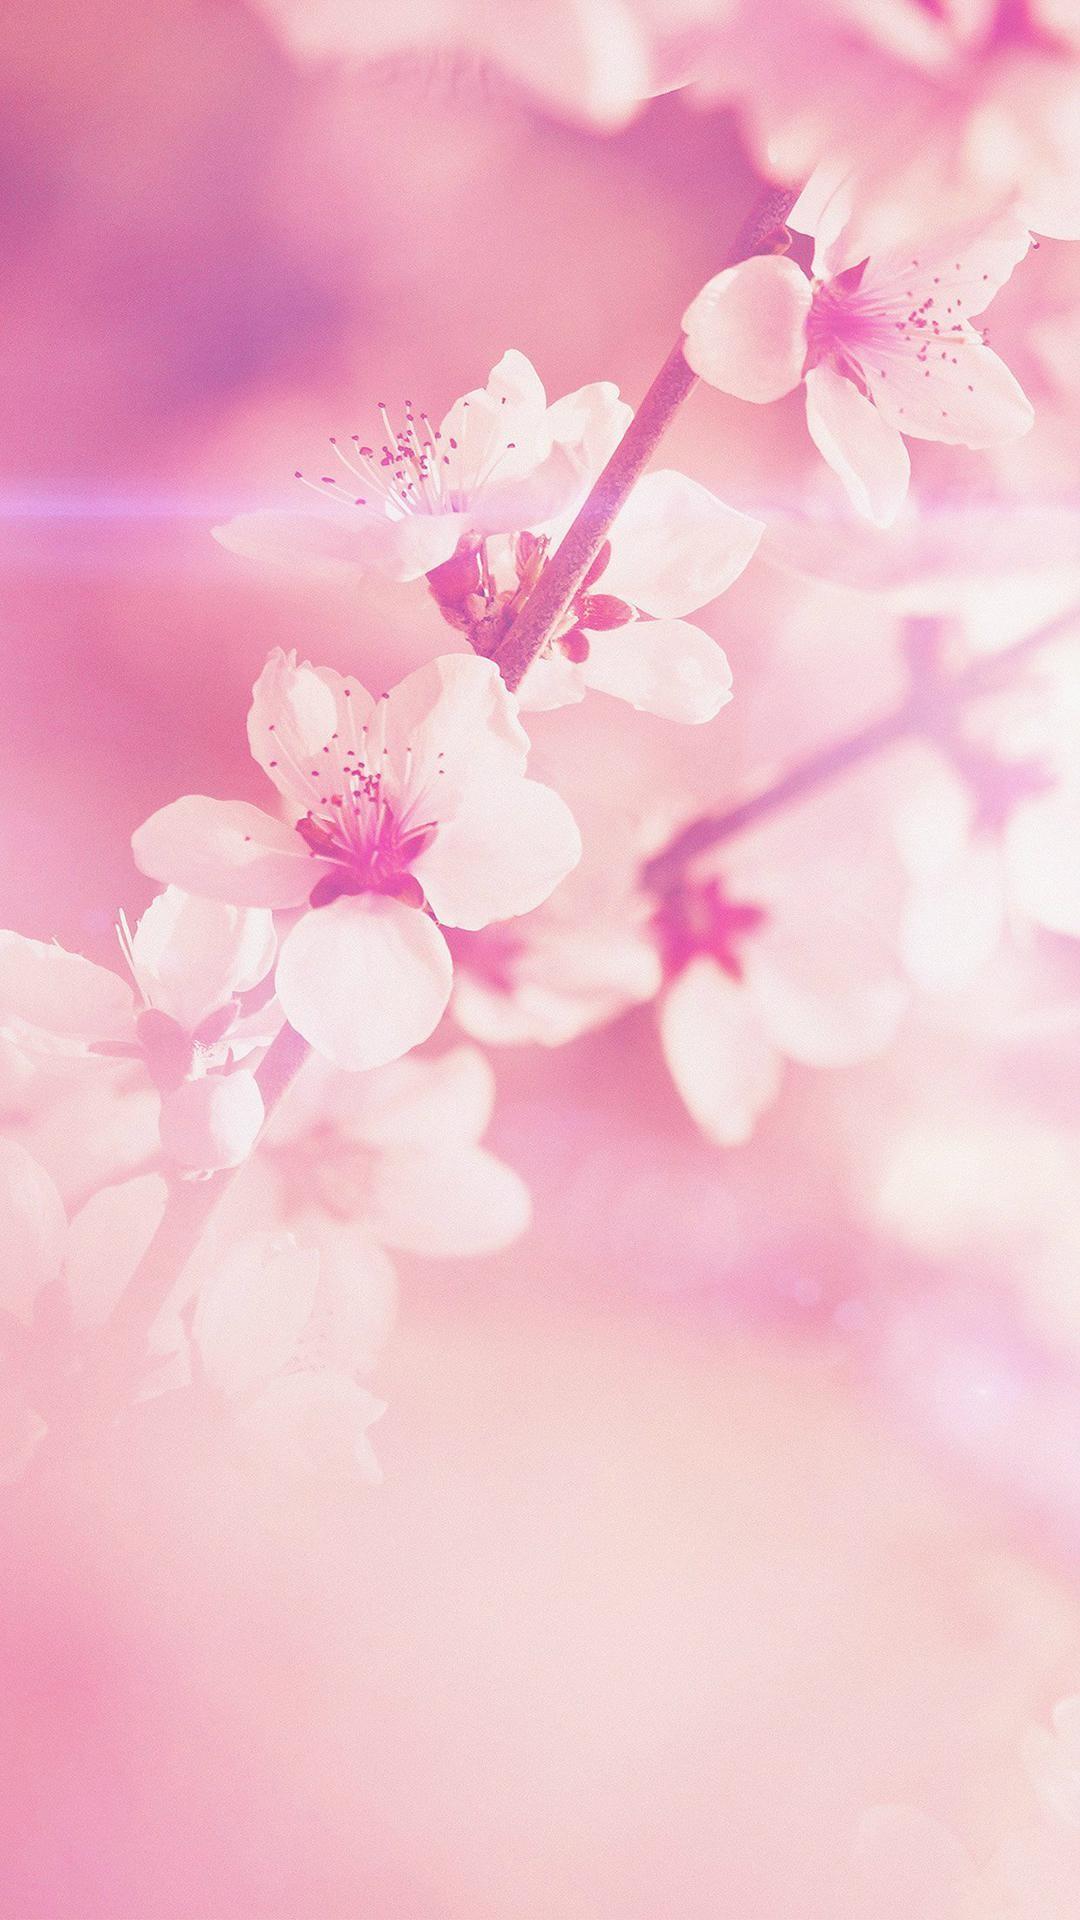 wallpaper.wiki-Free-Cool-Pink-Iphone-Image-Download-